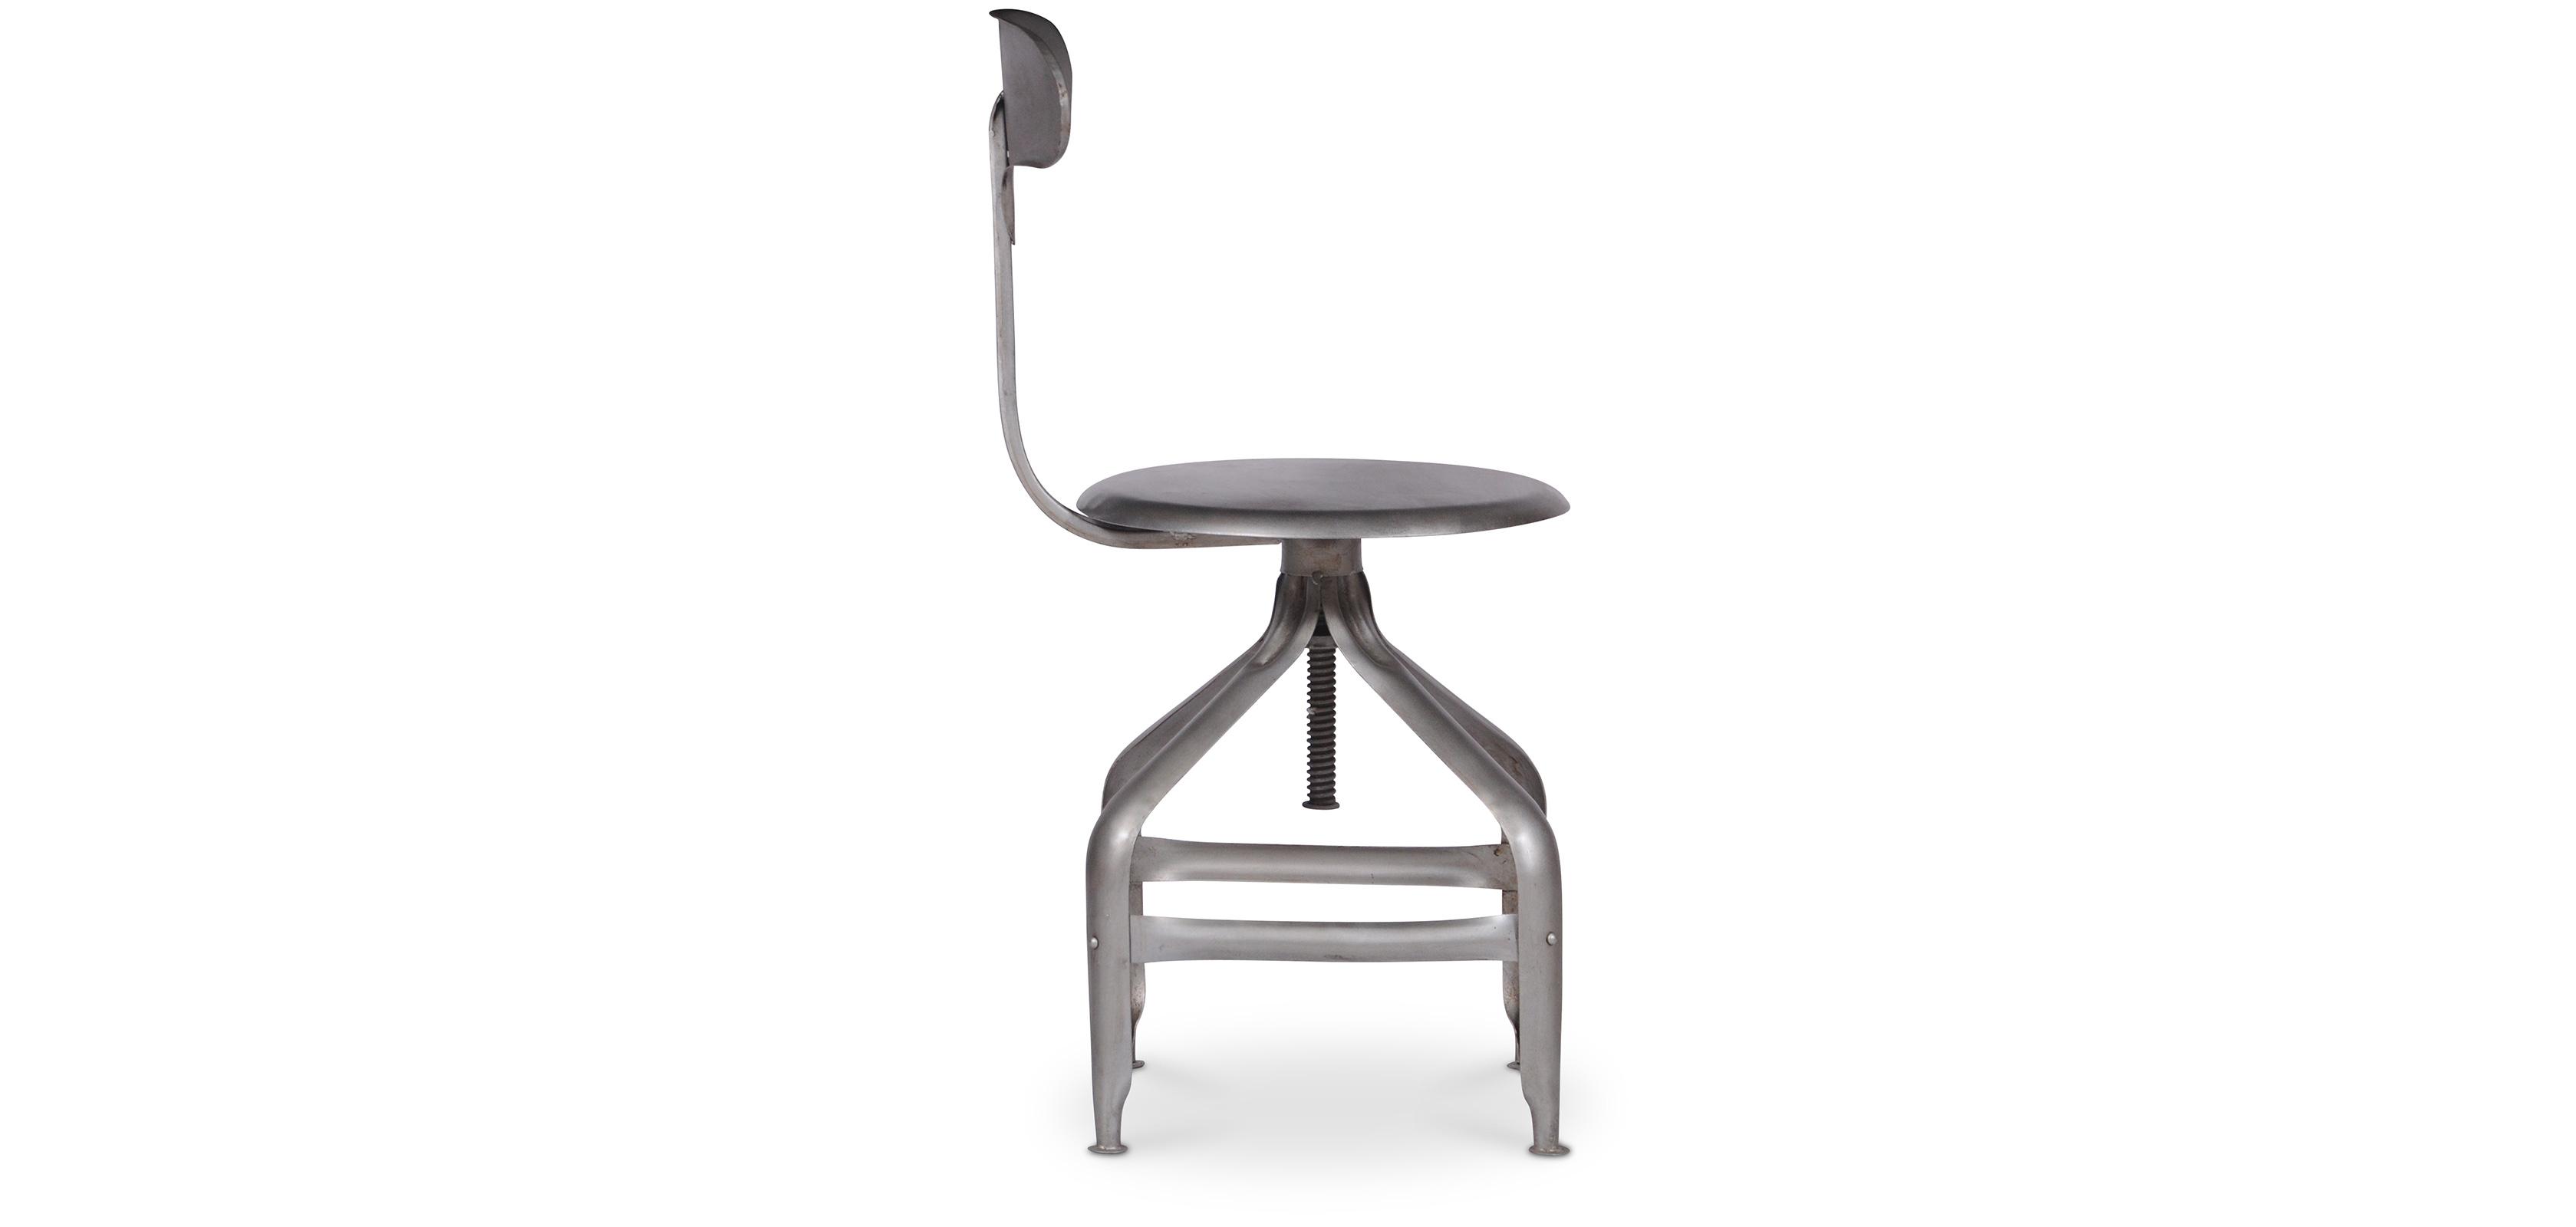 Industrial design stuhl metall for Design stuhl metall